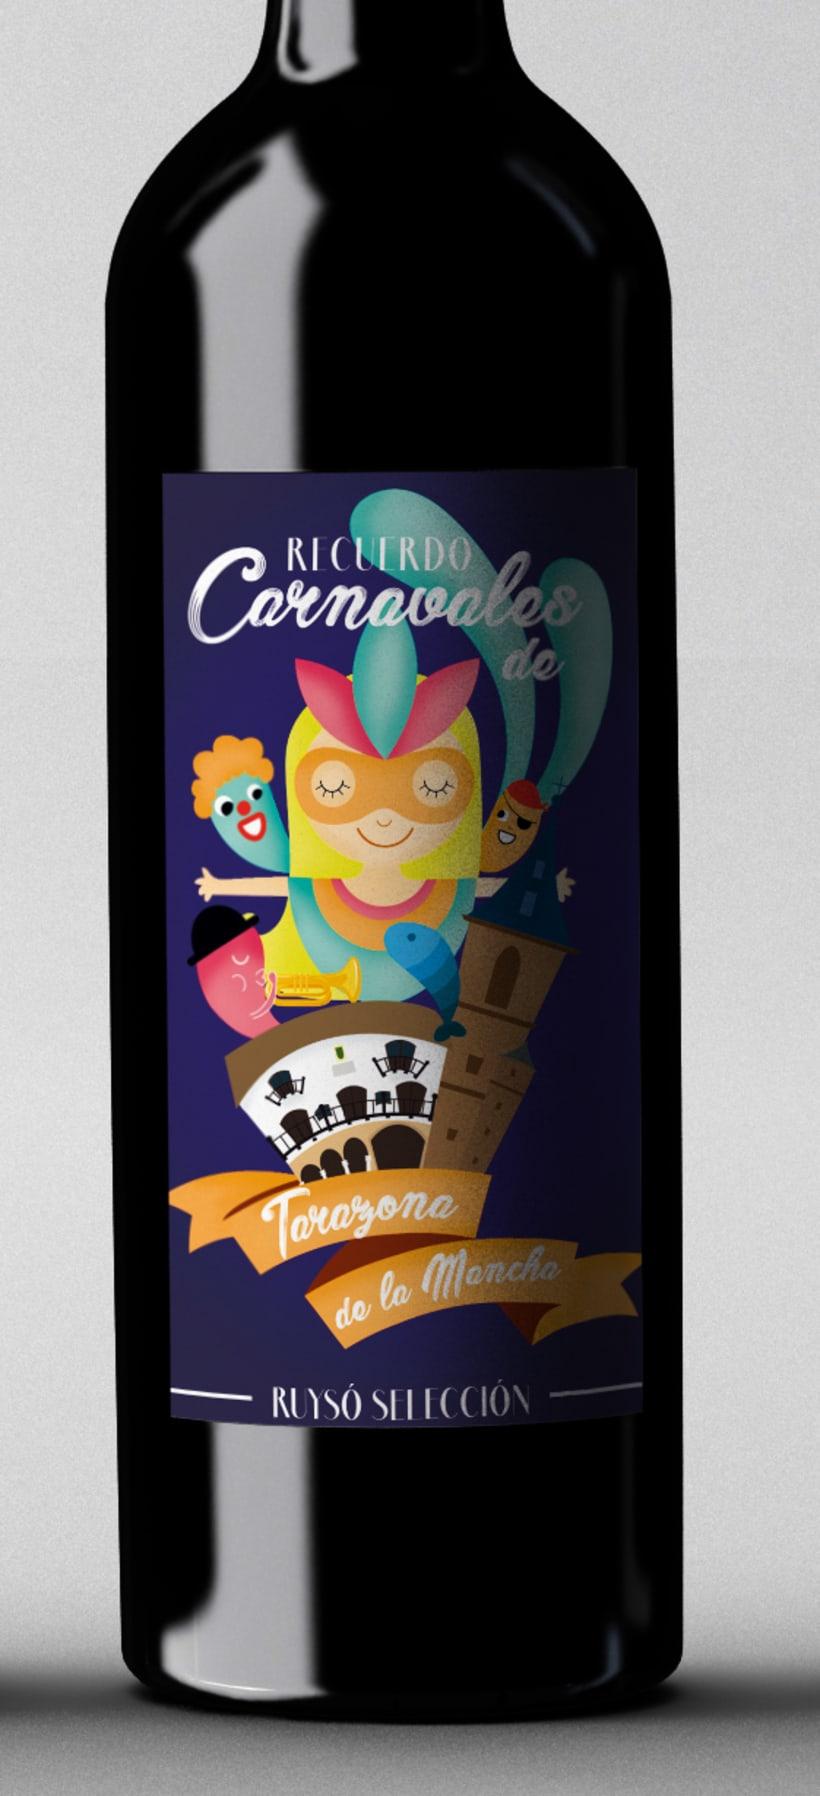 Vino Carnaval 2